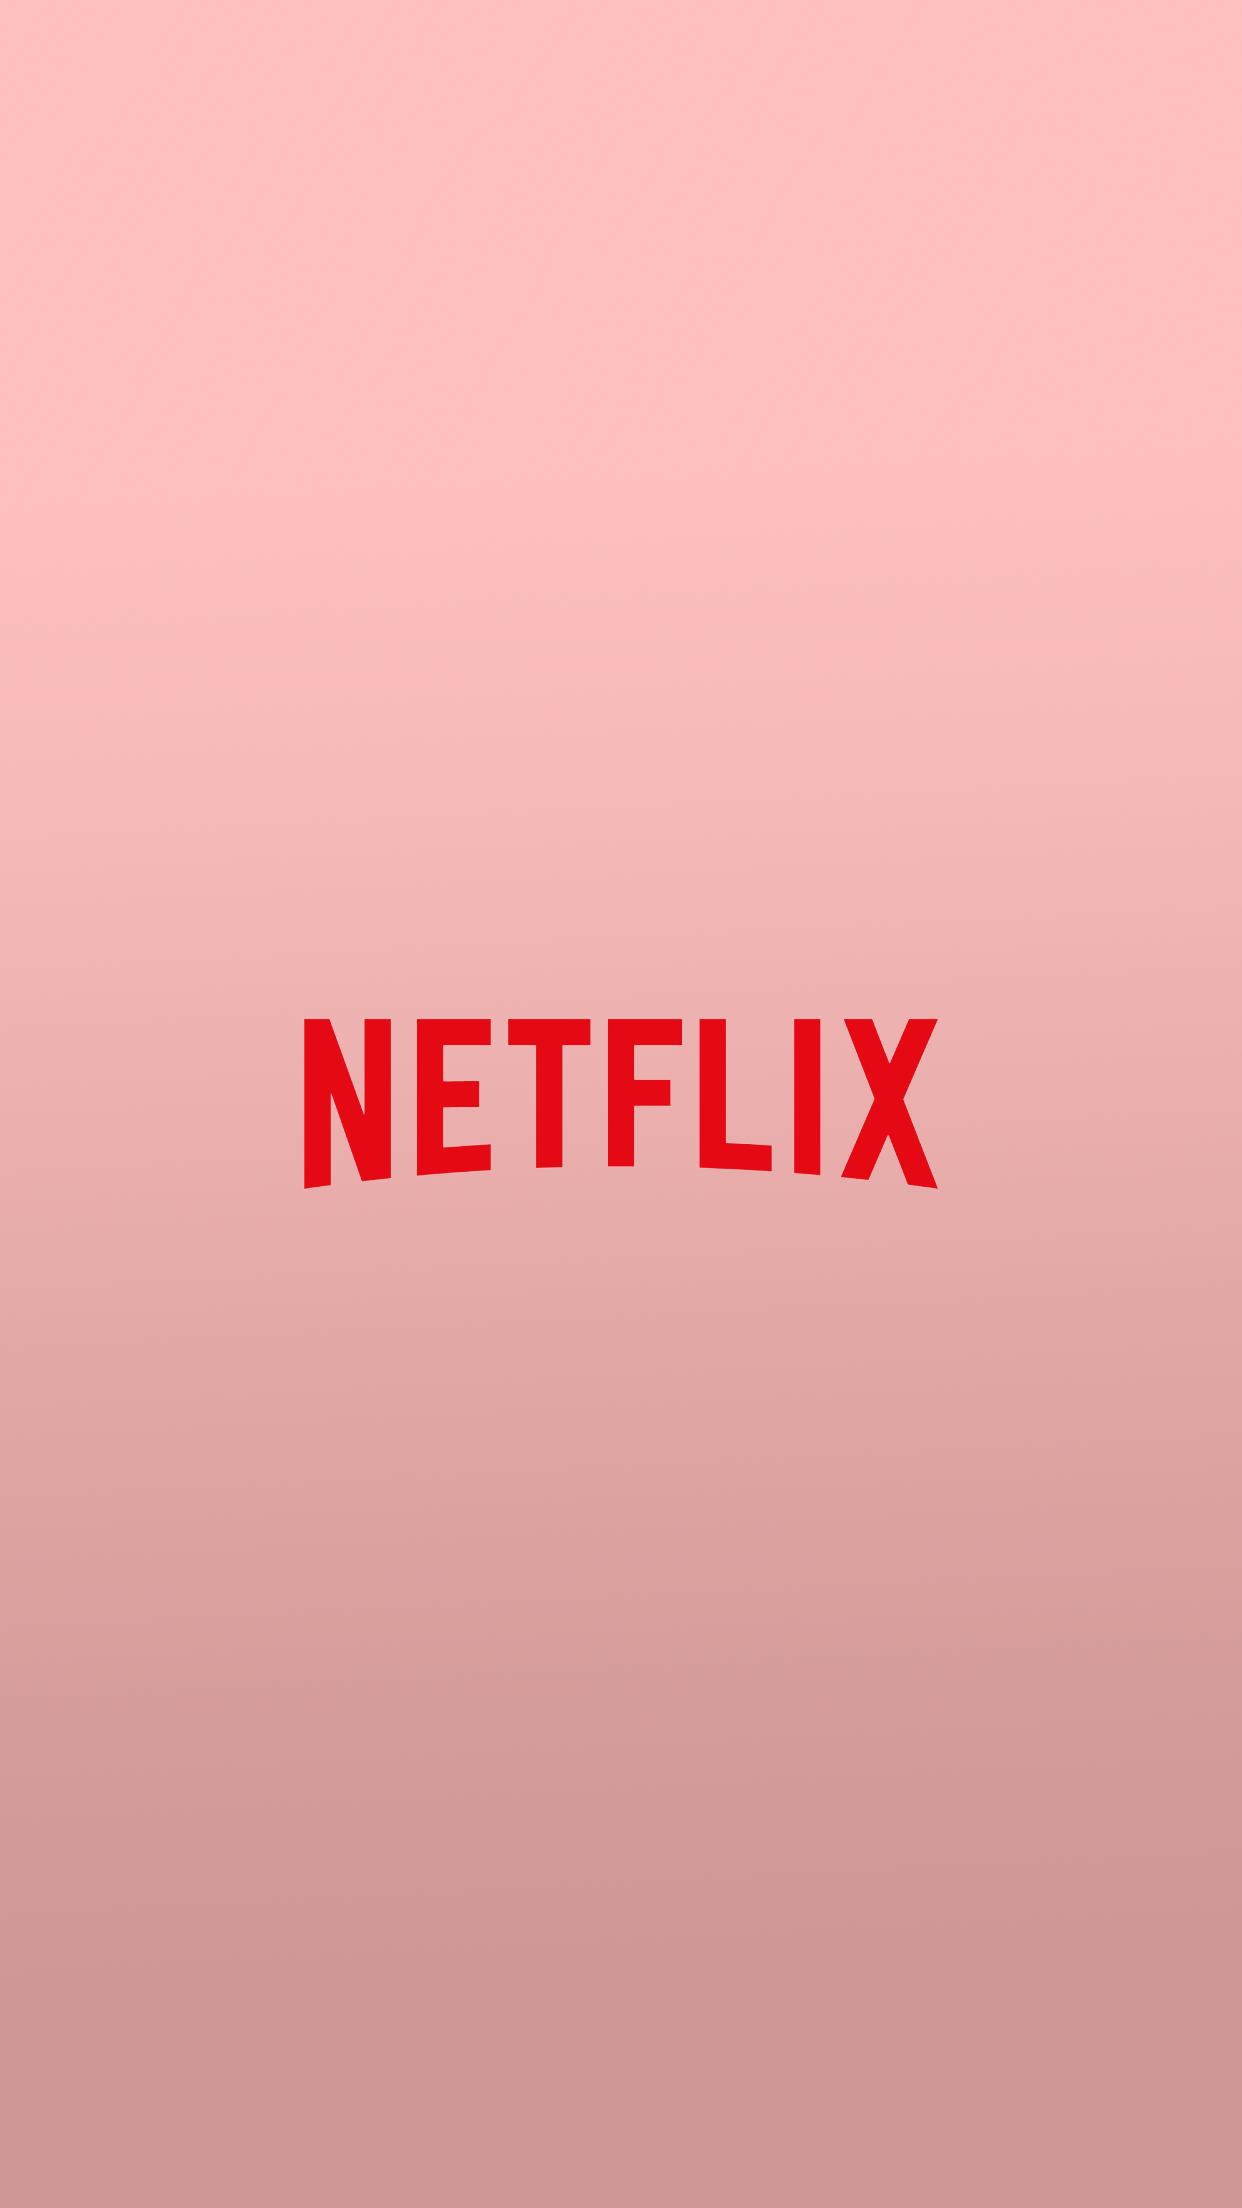 Netflix Wallpaper Iphone 6 plus wallpaper Iphone wallpaper 1242x2208